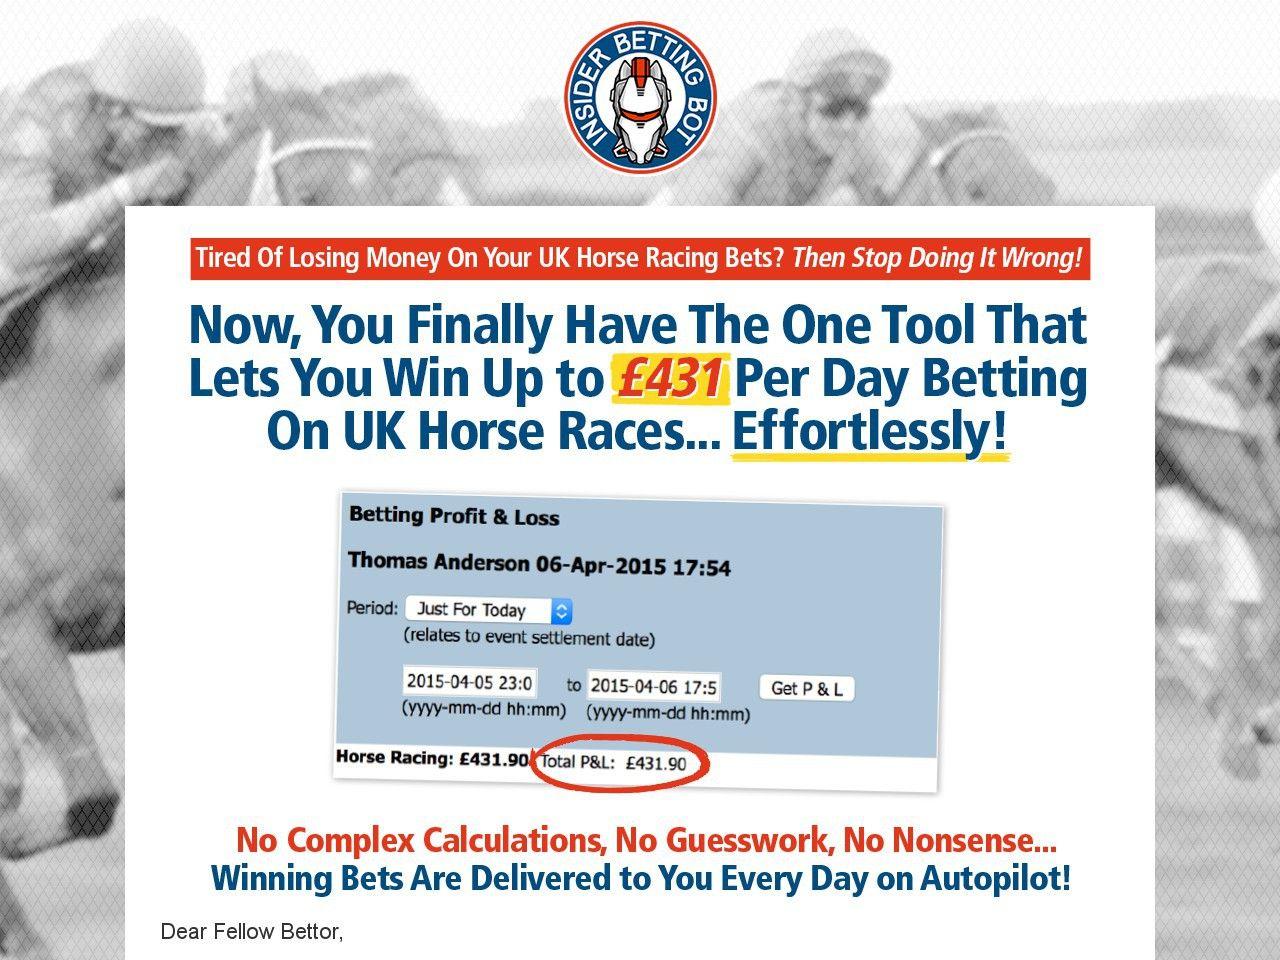 [Get] Insider Betting Bot - http://www.vnulab.be/lab-review/insider-betting-bot ,http://s.wordpress.com/mshots/v1/http%3A%2F%2Fforexrbot.racingbot.hop.clickbank.net